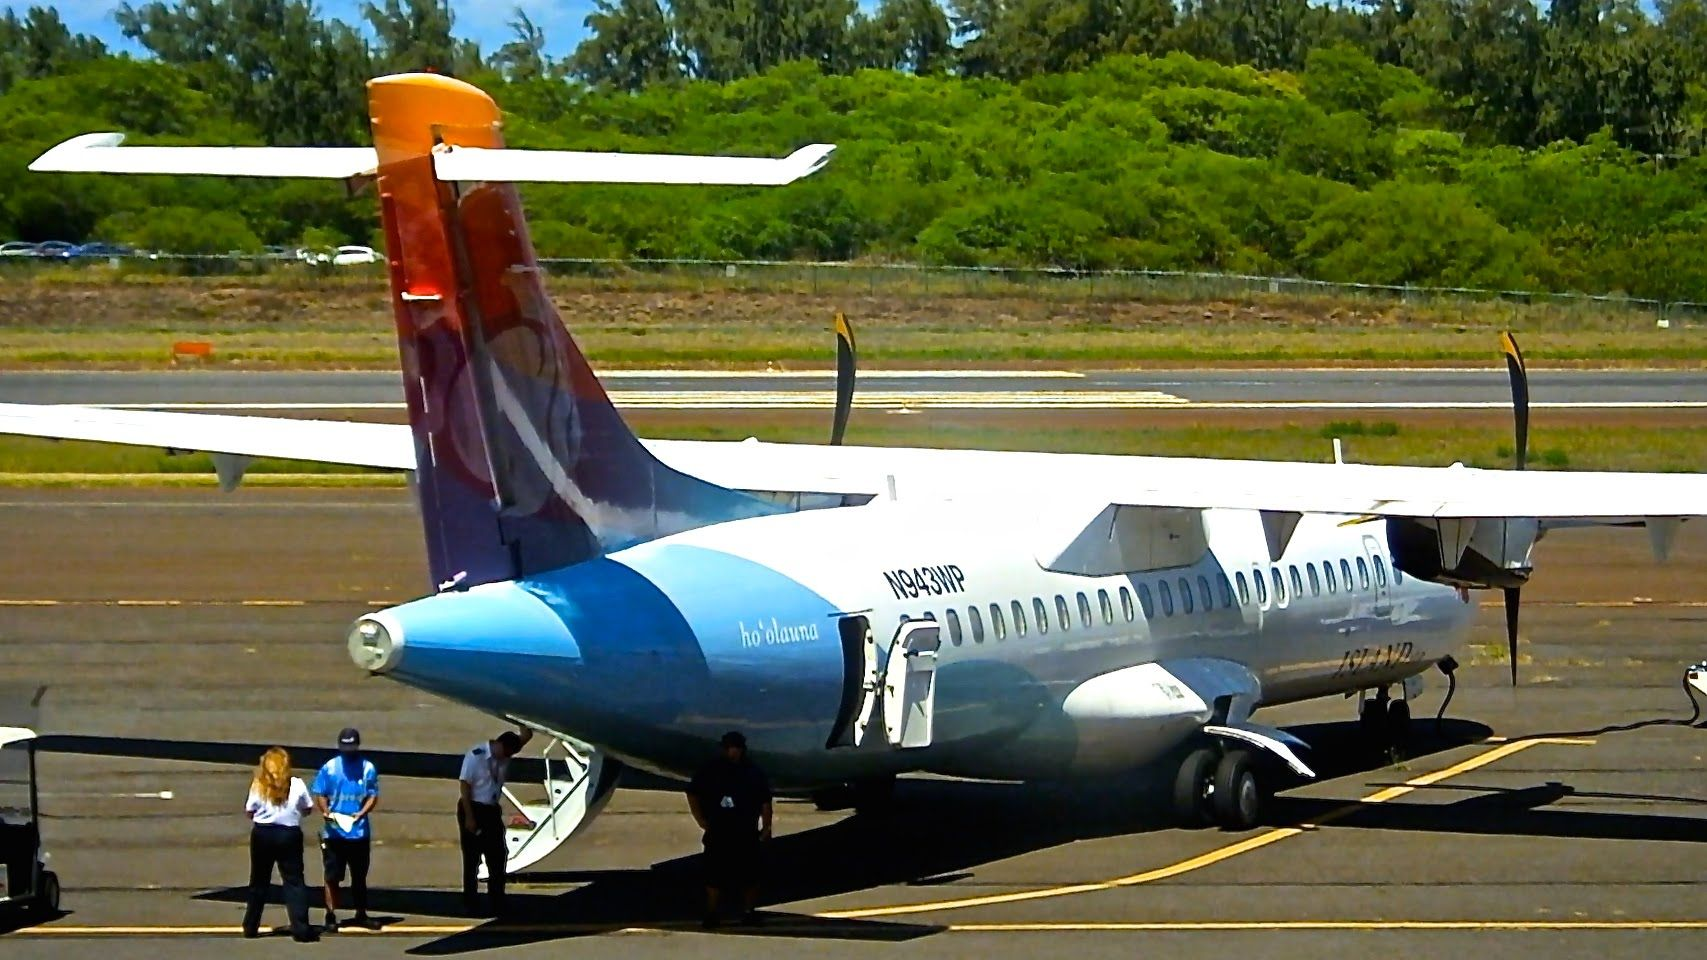 Kahului (OGG) Spotting - Island Air/United - Boeing 737-800 & More - Spo...